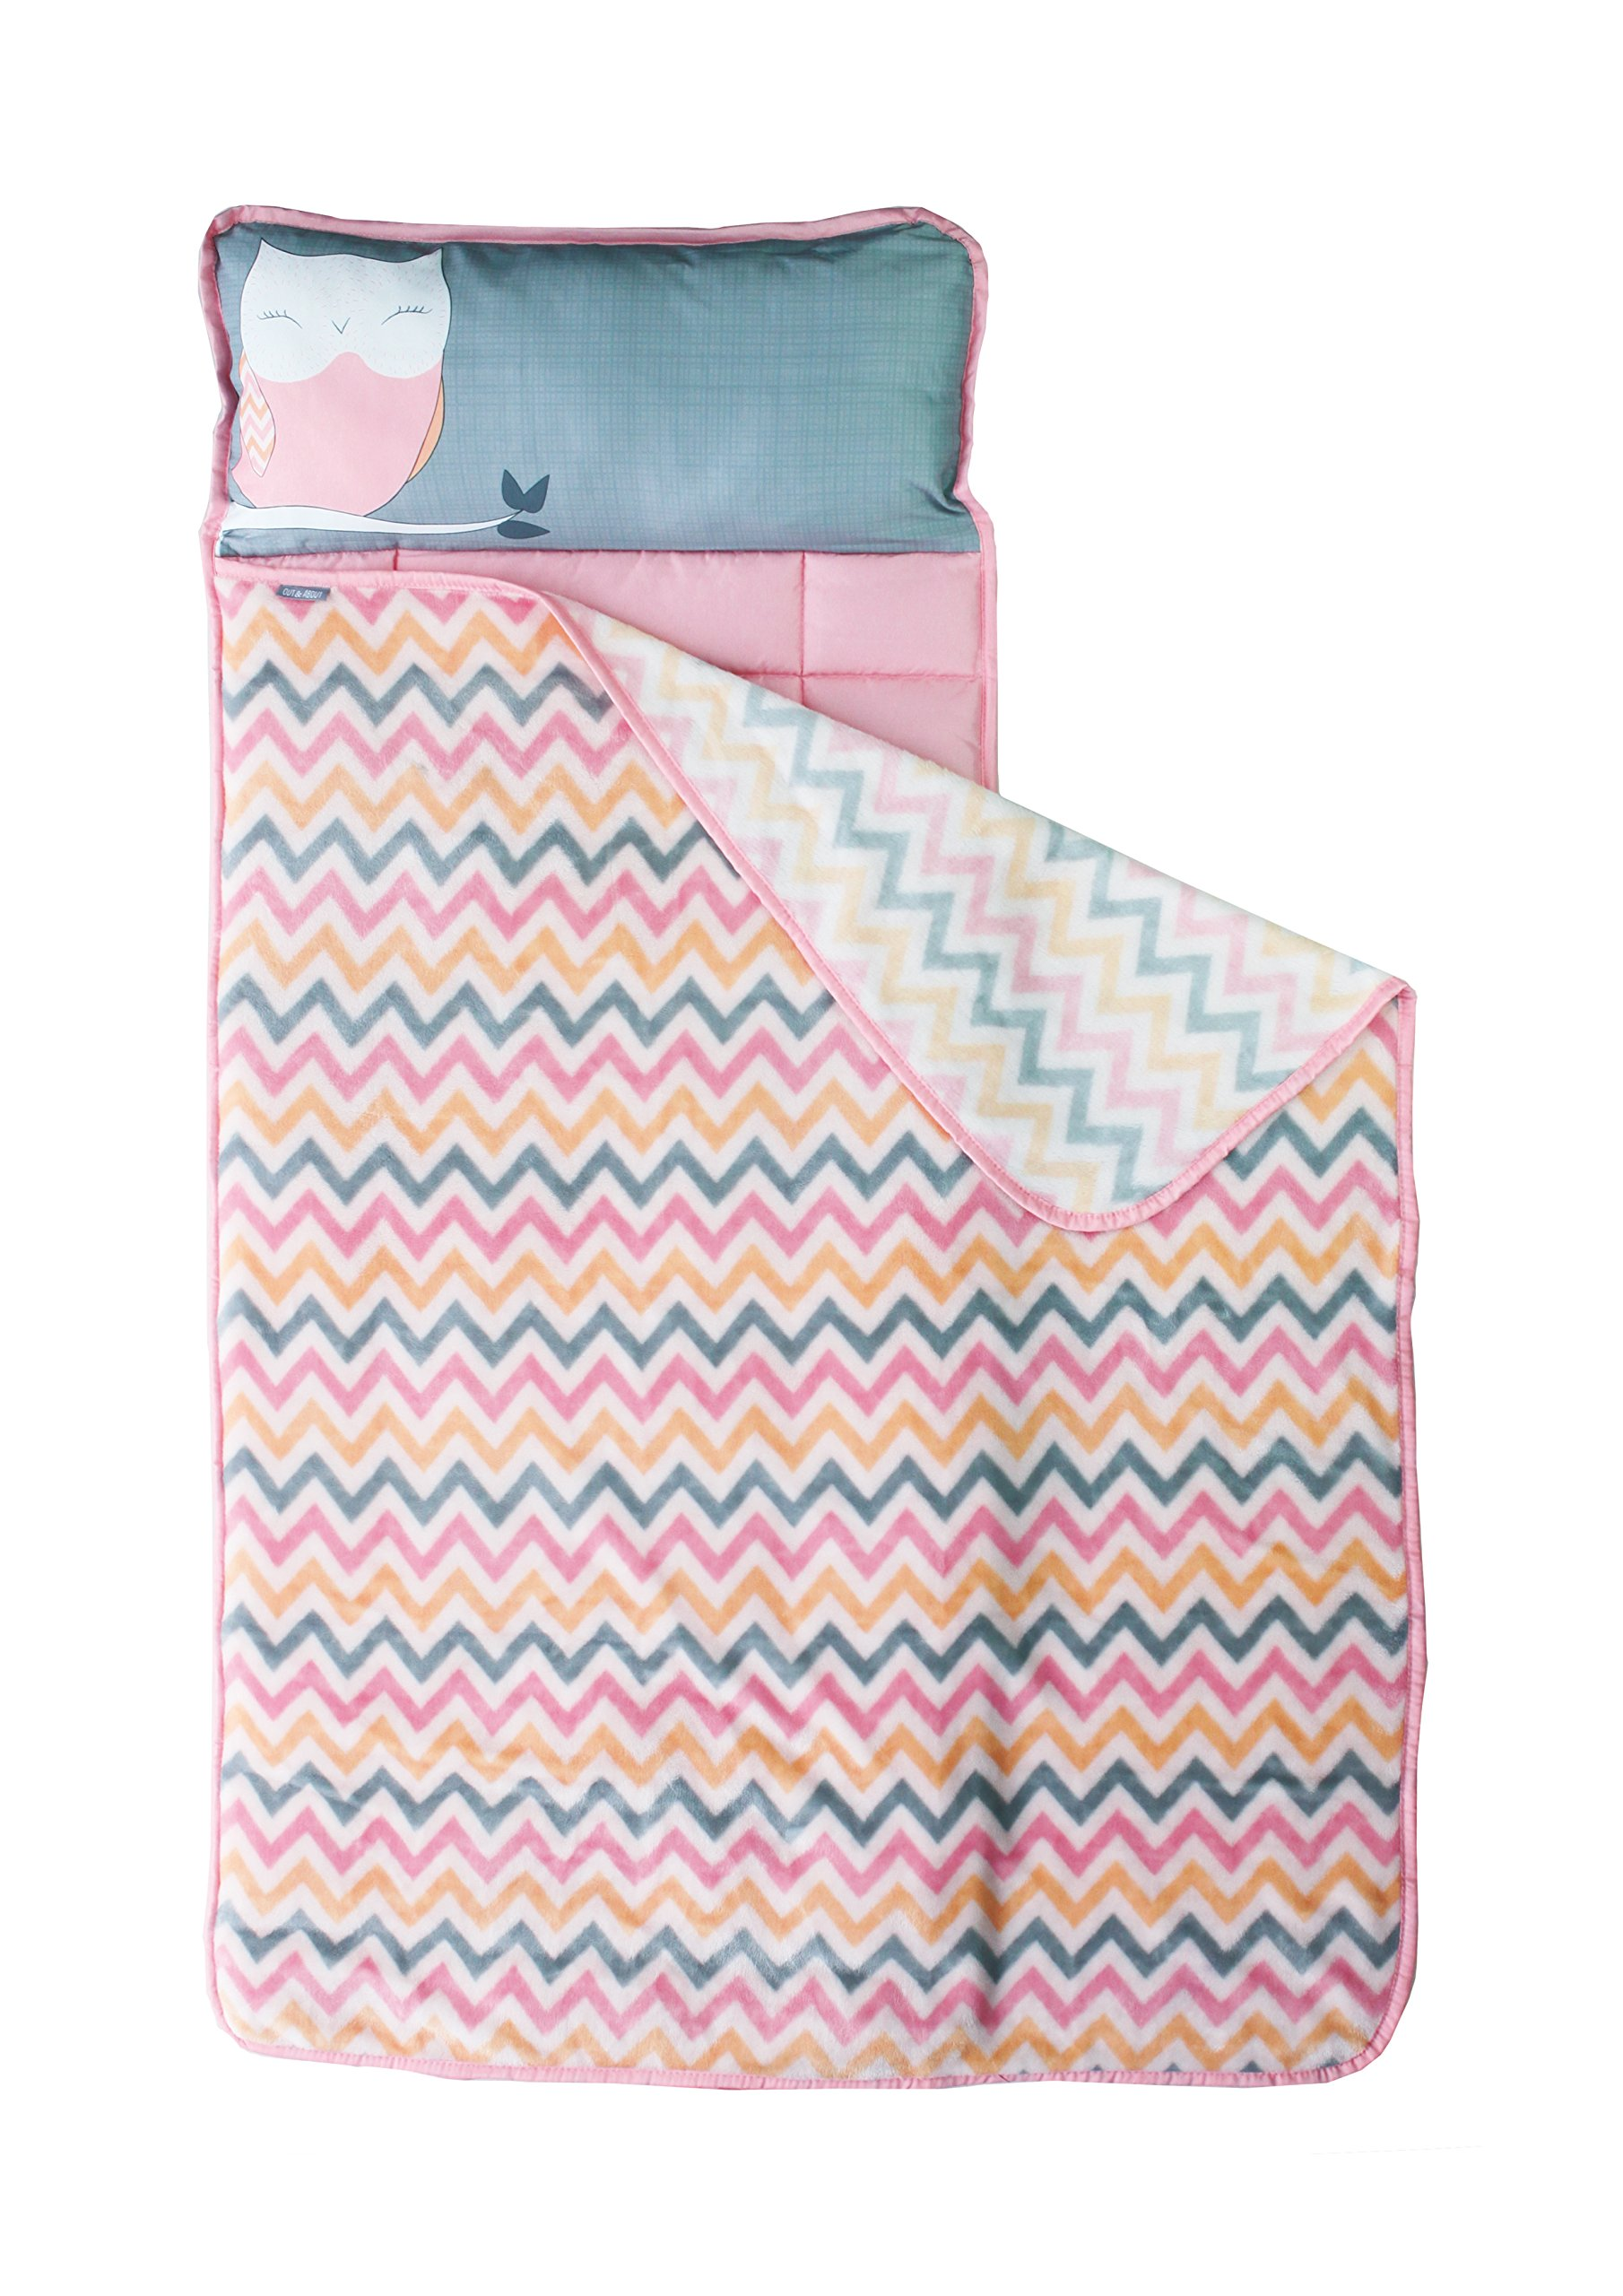 Toddler Nap Mat - Portable Washable Plush Blanket & Padded Mattress (Chevron Owl) By Homezy